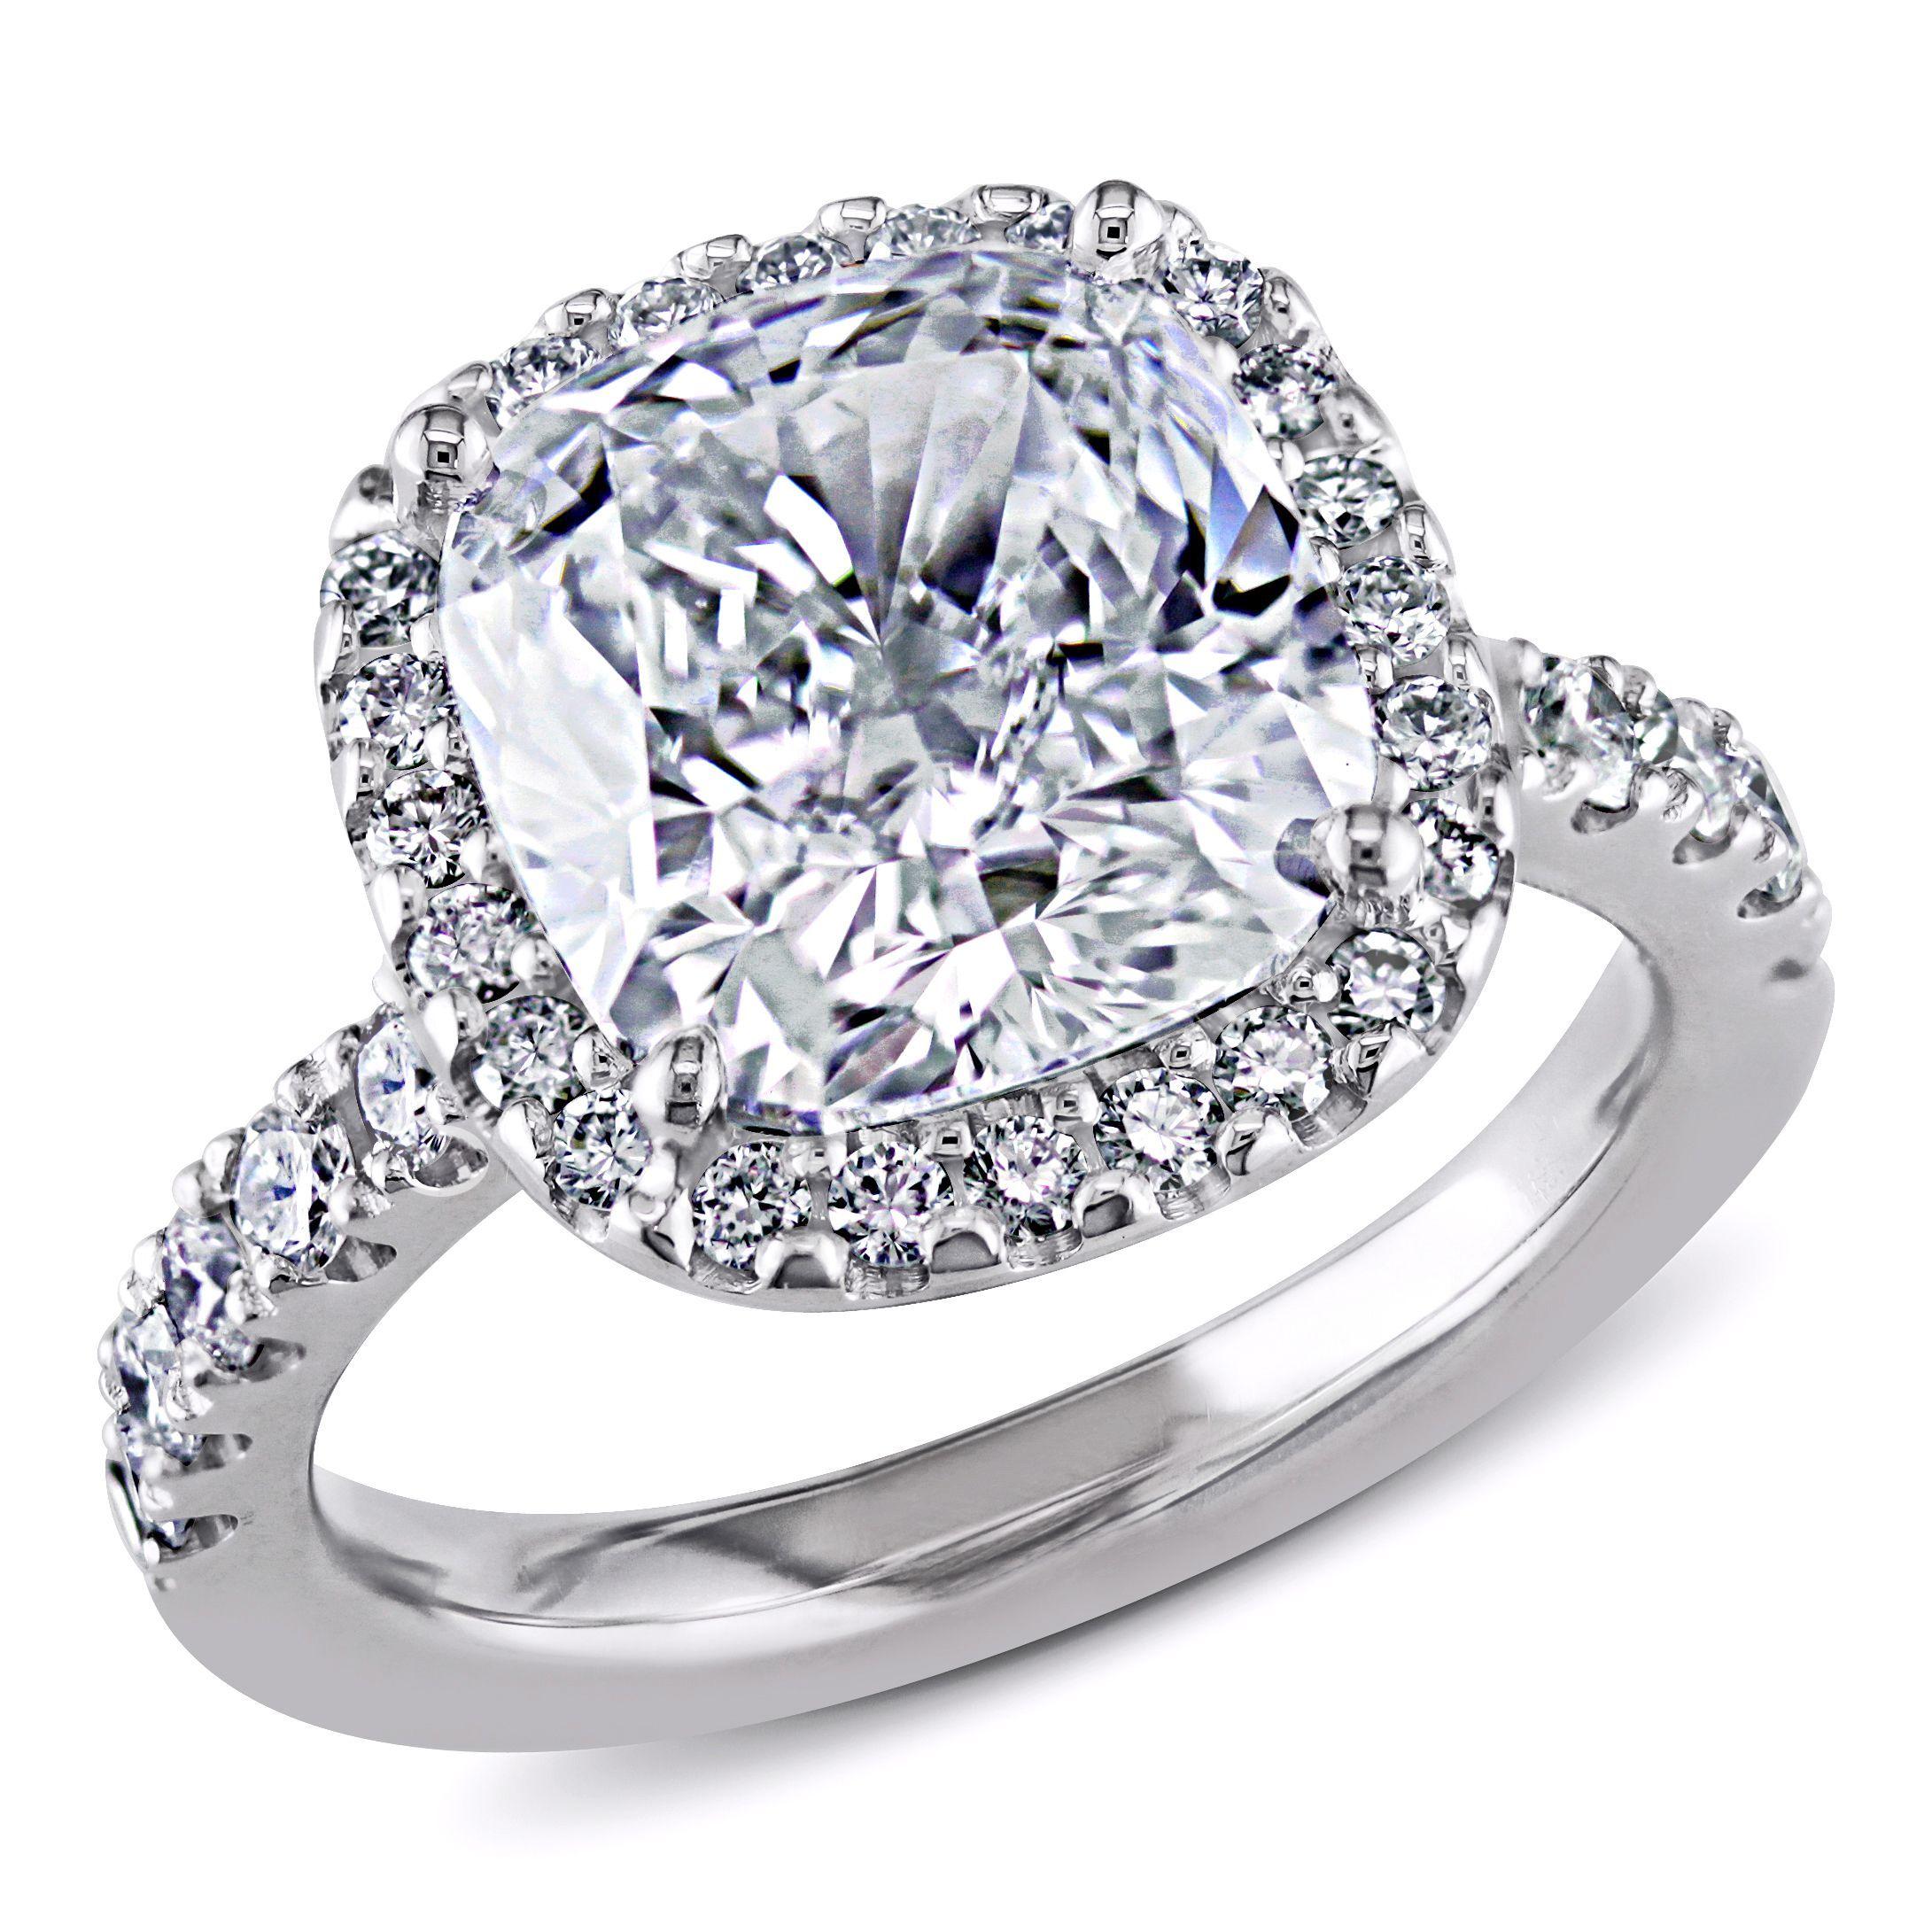 Miadora signature collection 14k white gold 1ct tdw diamond double row - 18k Gold 5 5 8ct Tdw Gia Certified Cushion Cut Halo Diamond Ring H Si1 By Miadora Signature Collection Size 10 Women S White